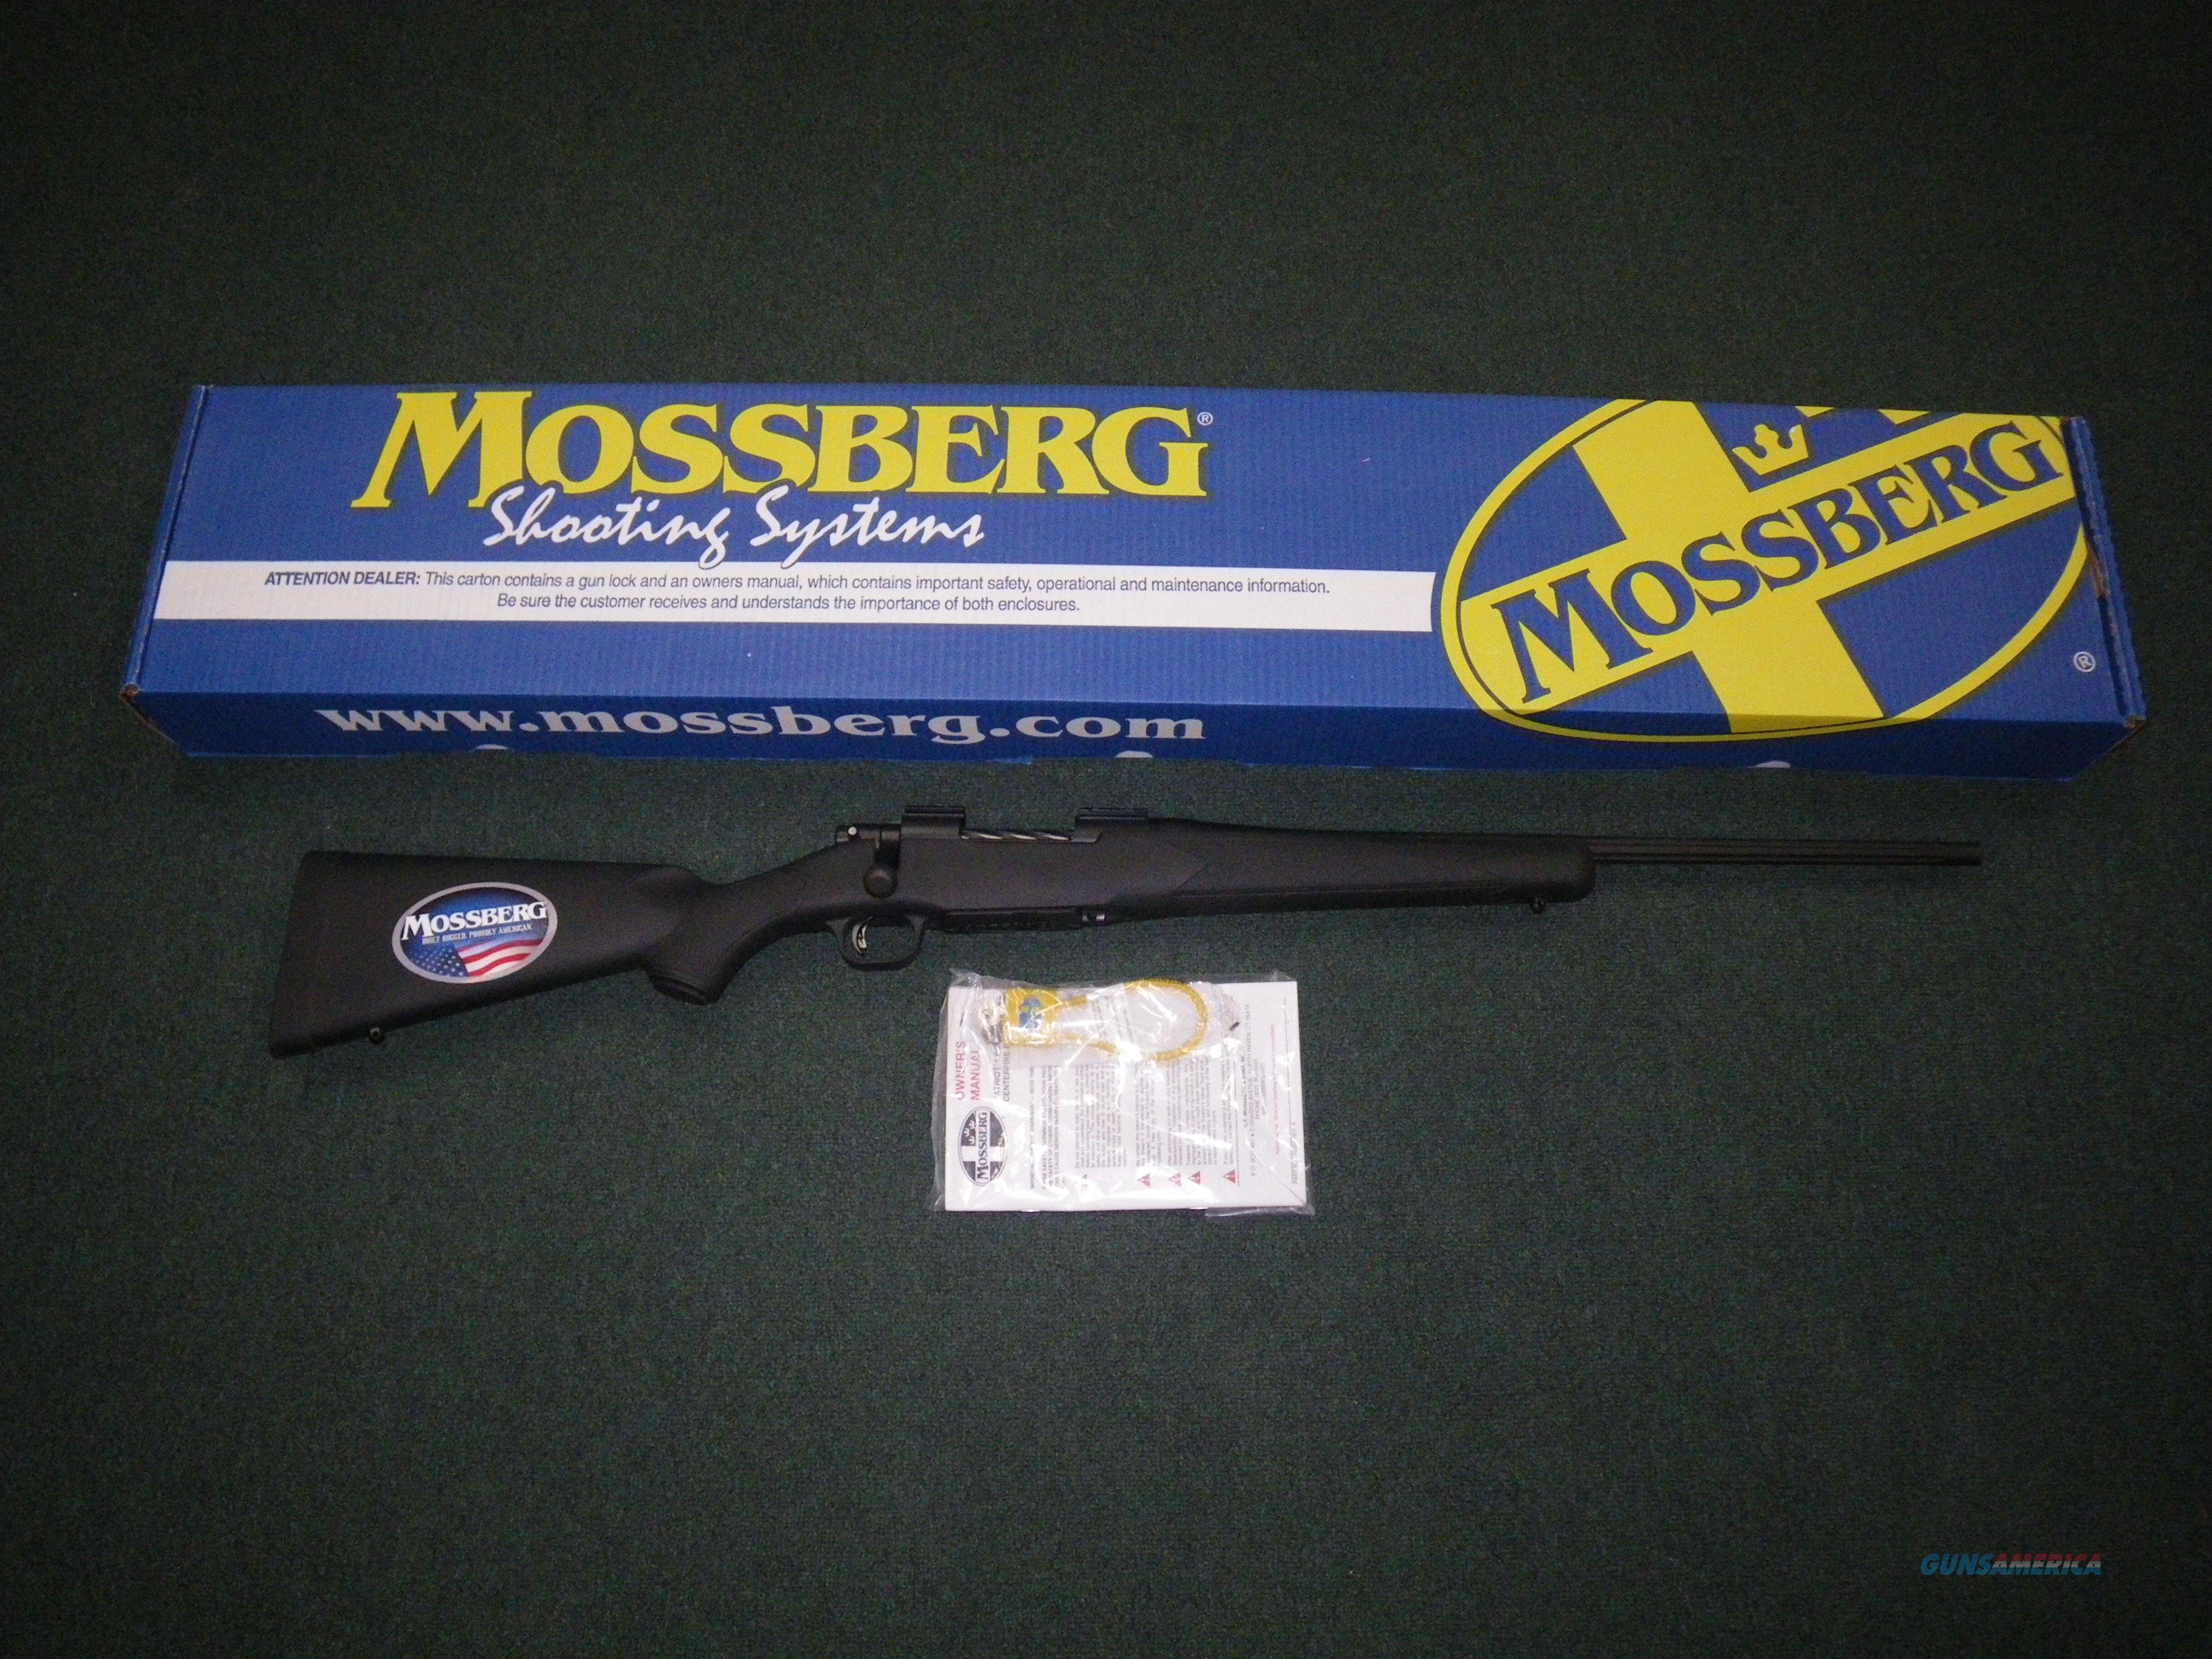 "Mossberg Patriot Synth 7mm Rem Mag 22"" Fluted NEW #27895  Guns > Rifles > Mossberg Rifles > Patriot"